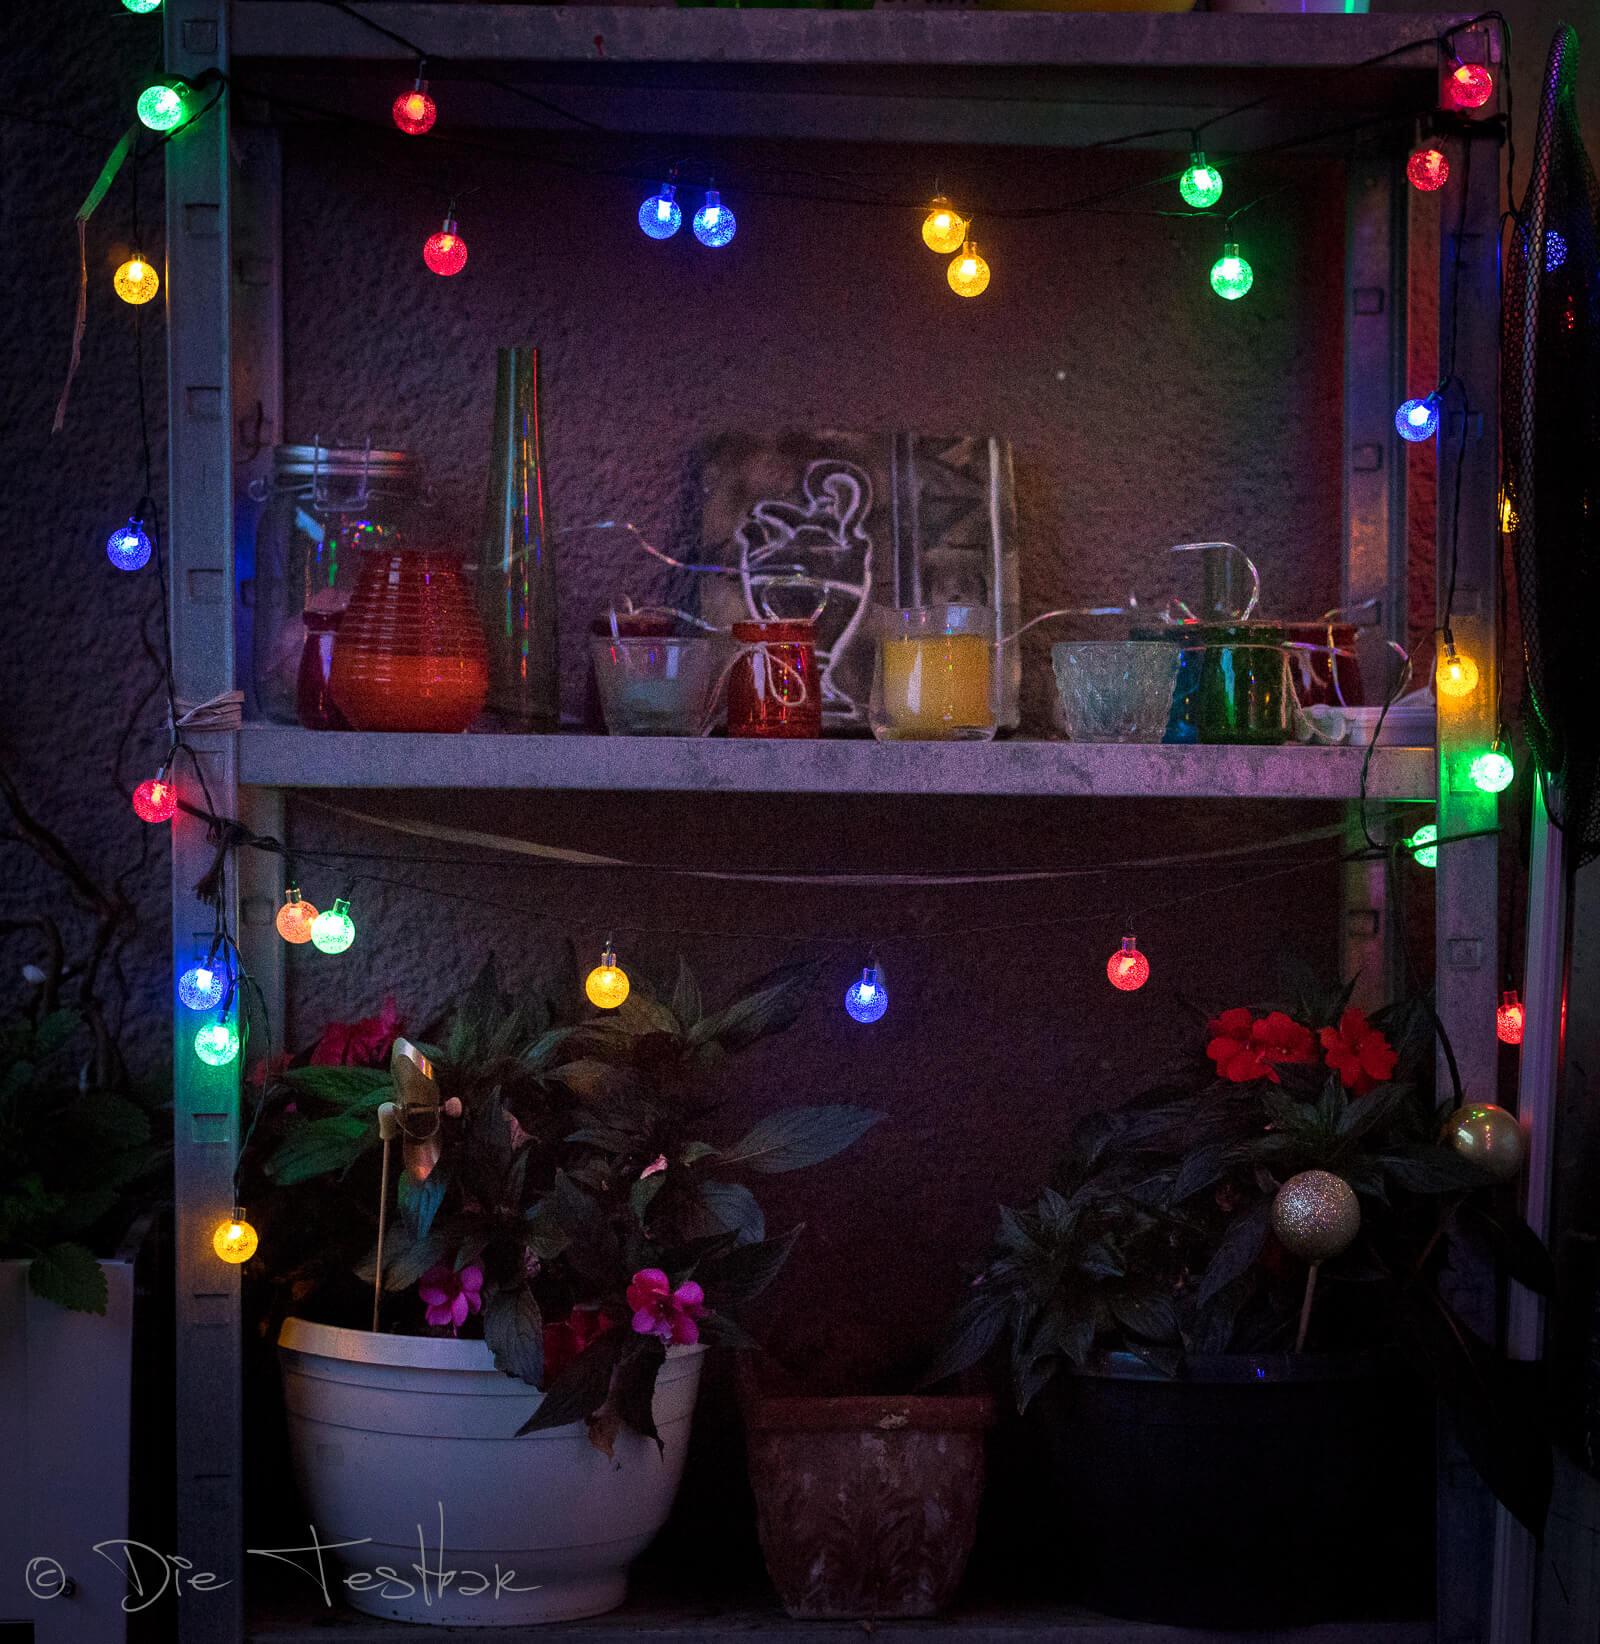 Balkongestaltung - Zauberhafte Outdoor-Beleuchtung von lights4fun